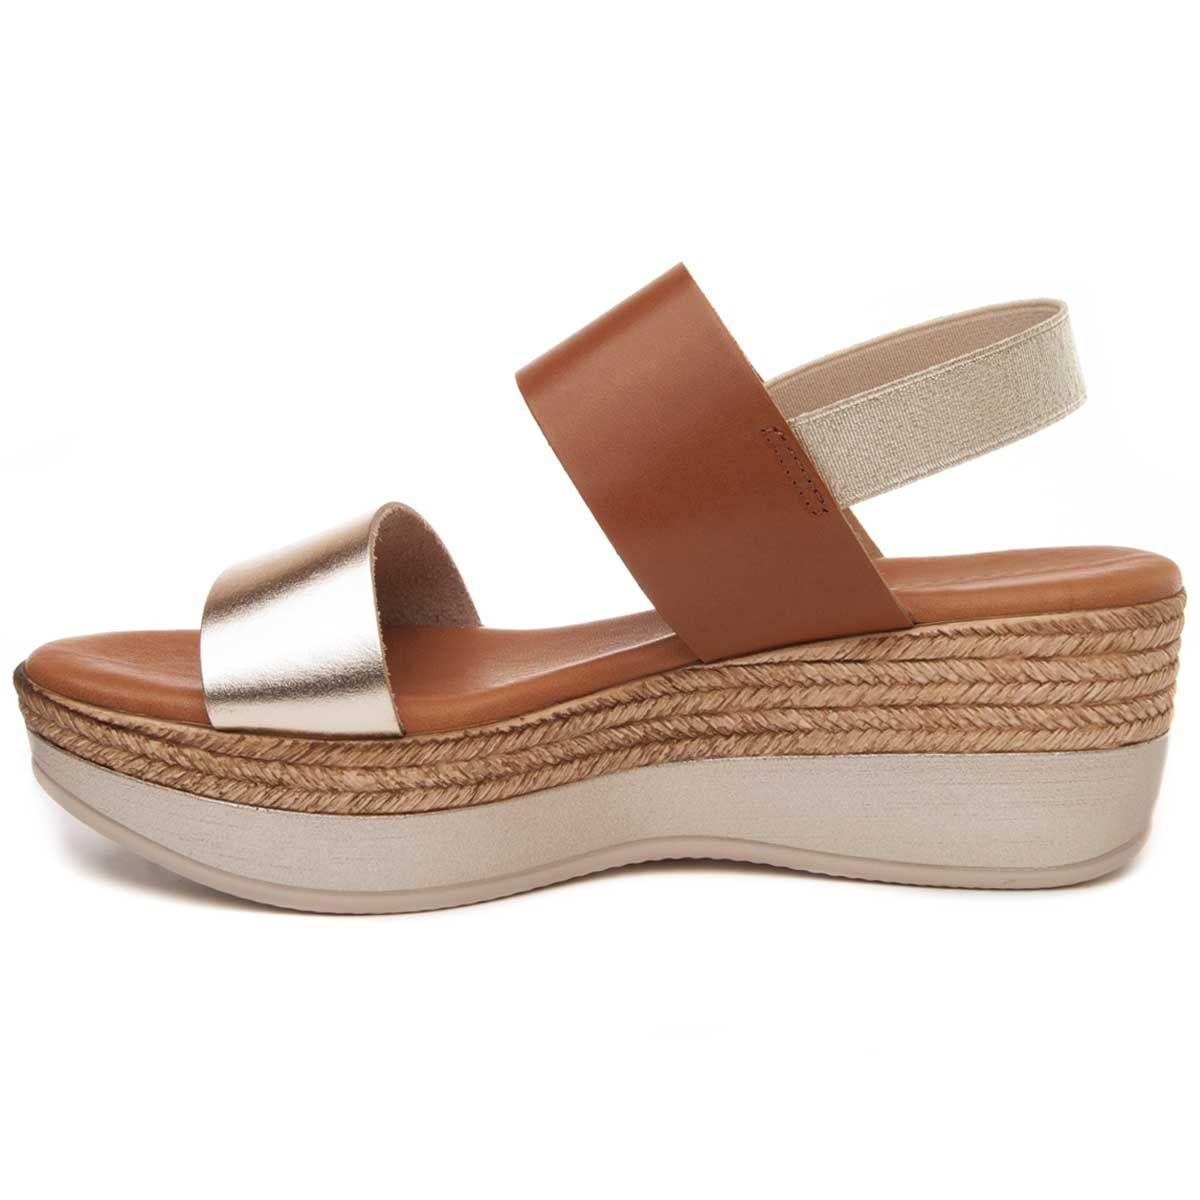 Purapiel Flatform Sandal in Brown